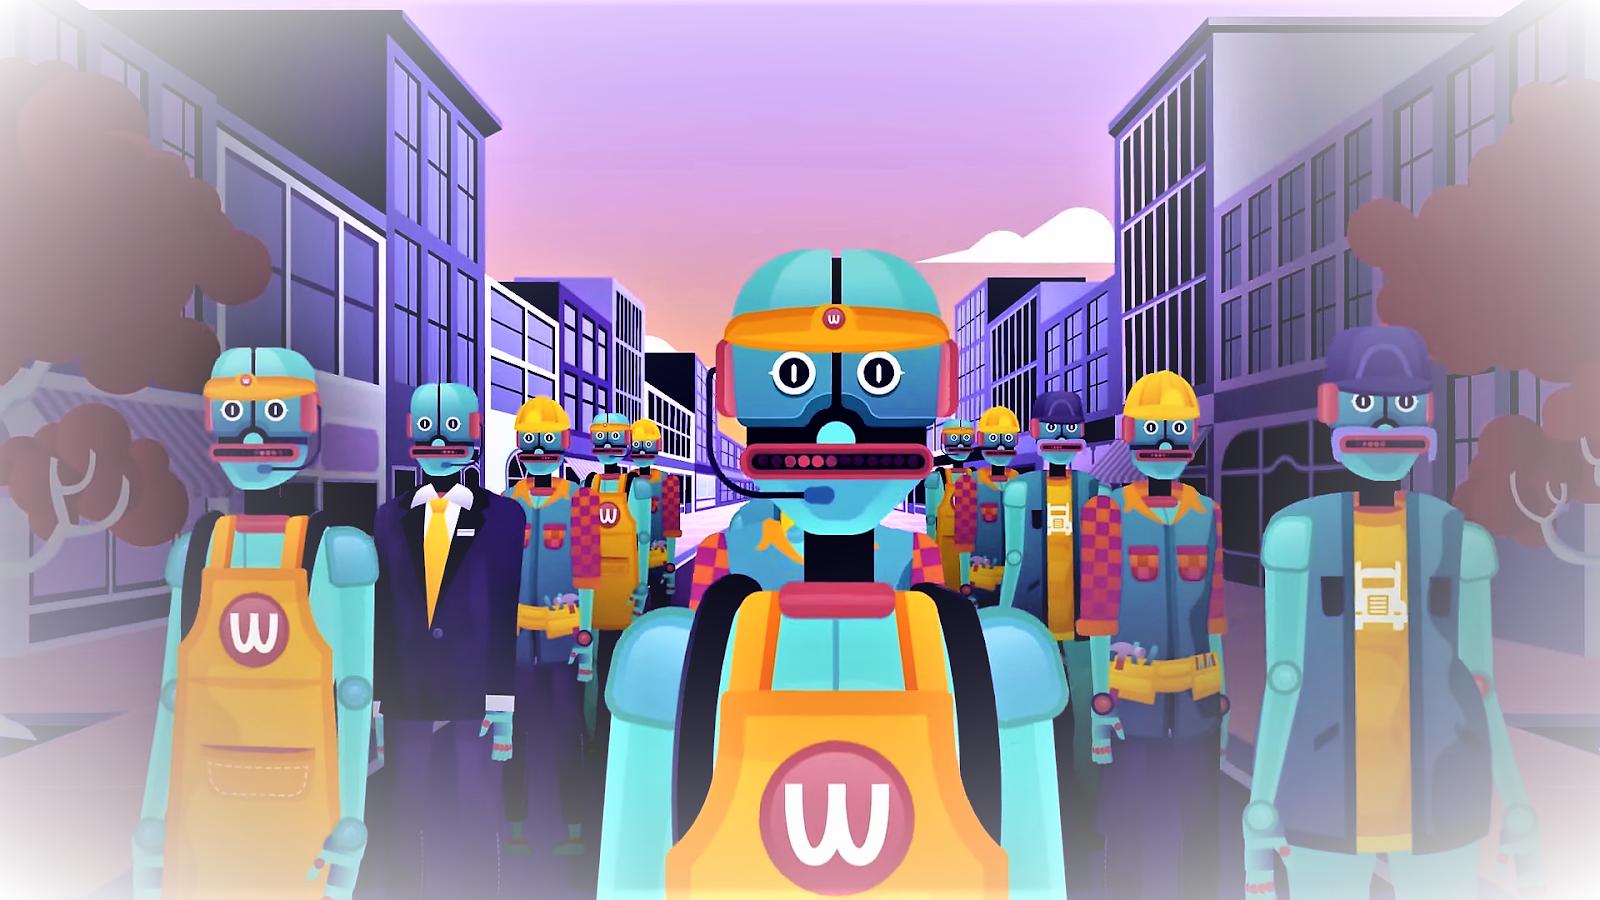 Will AI take away jobs? image.